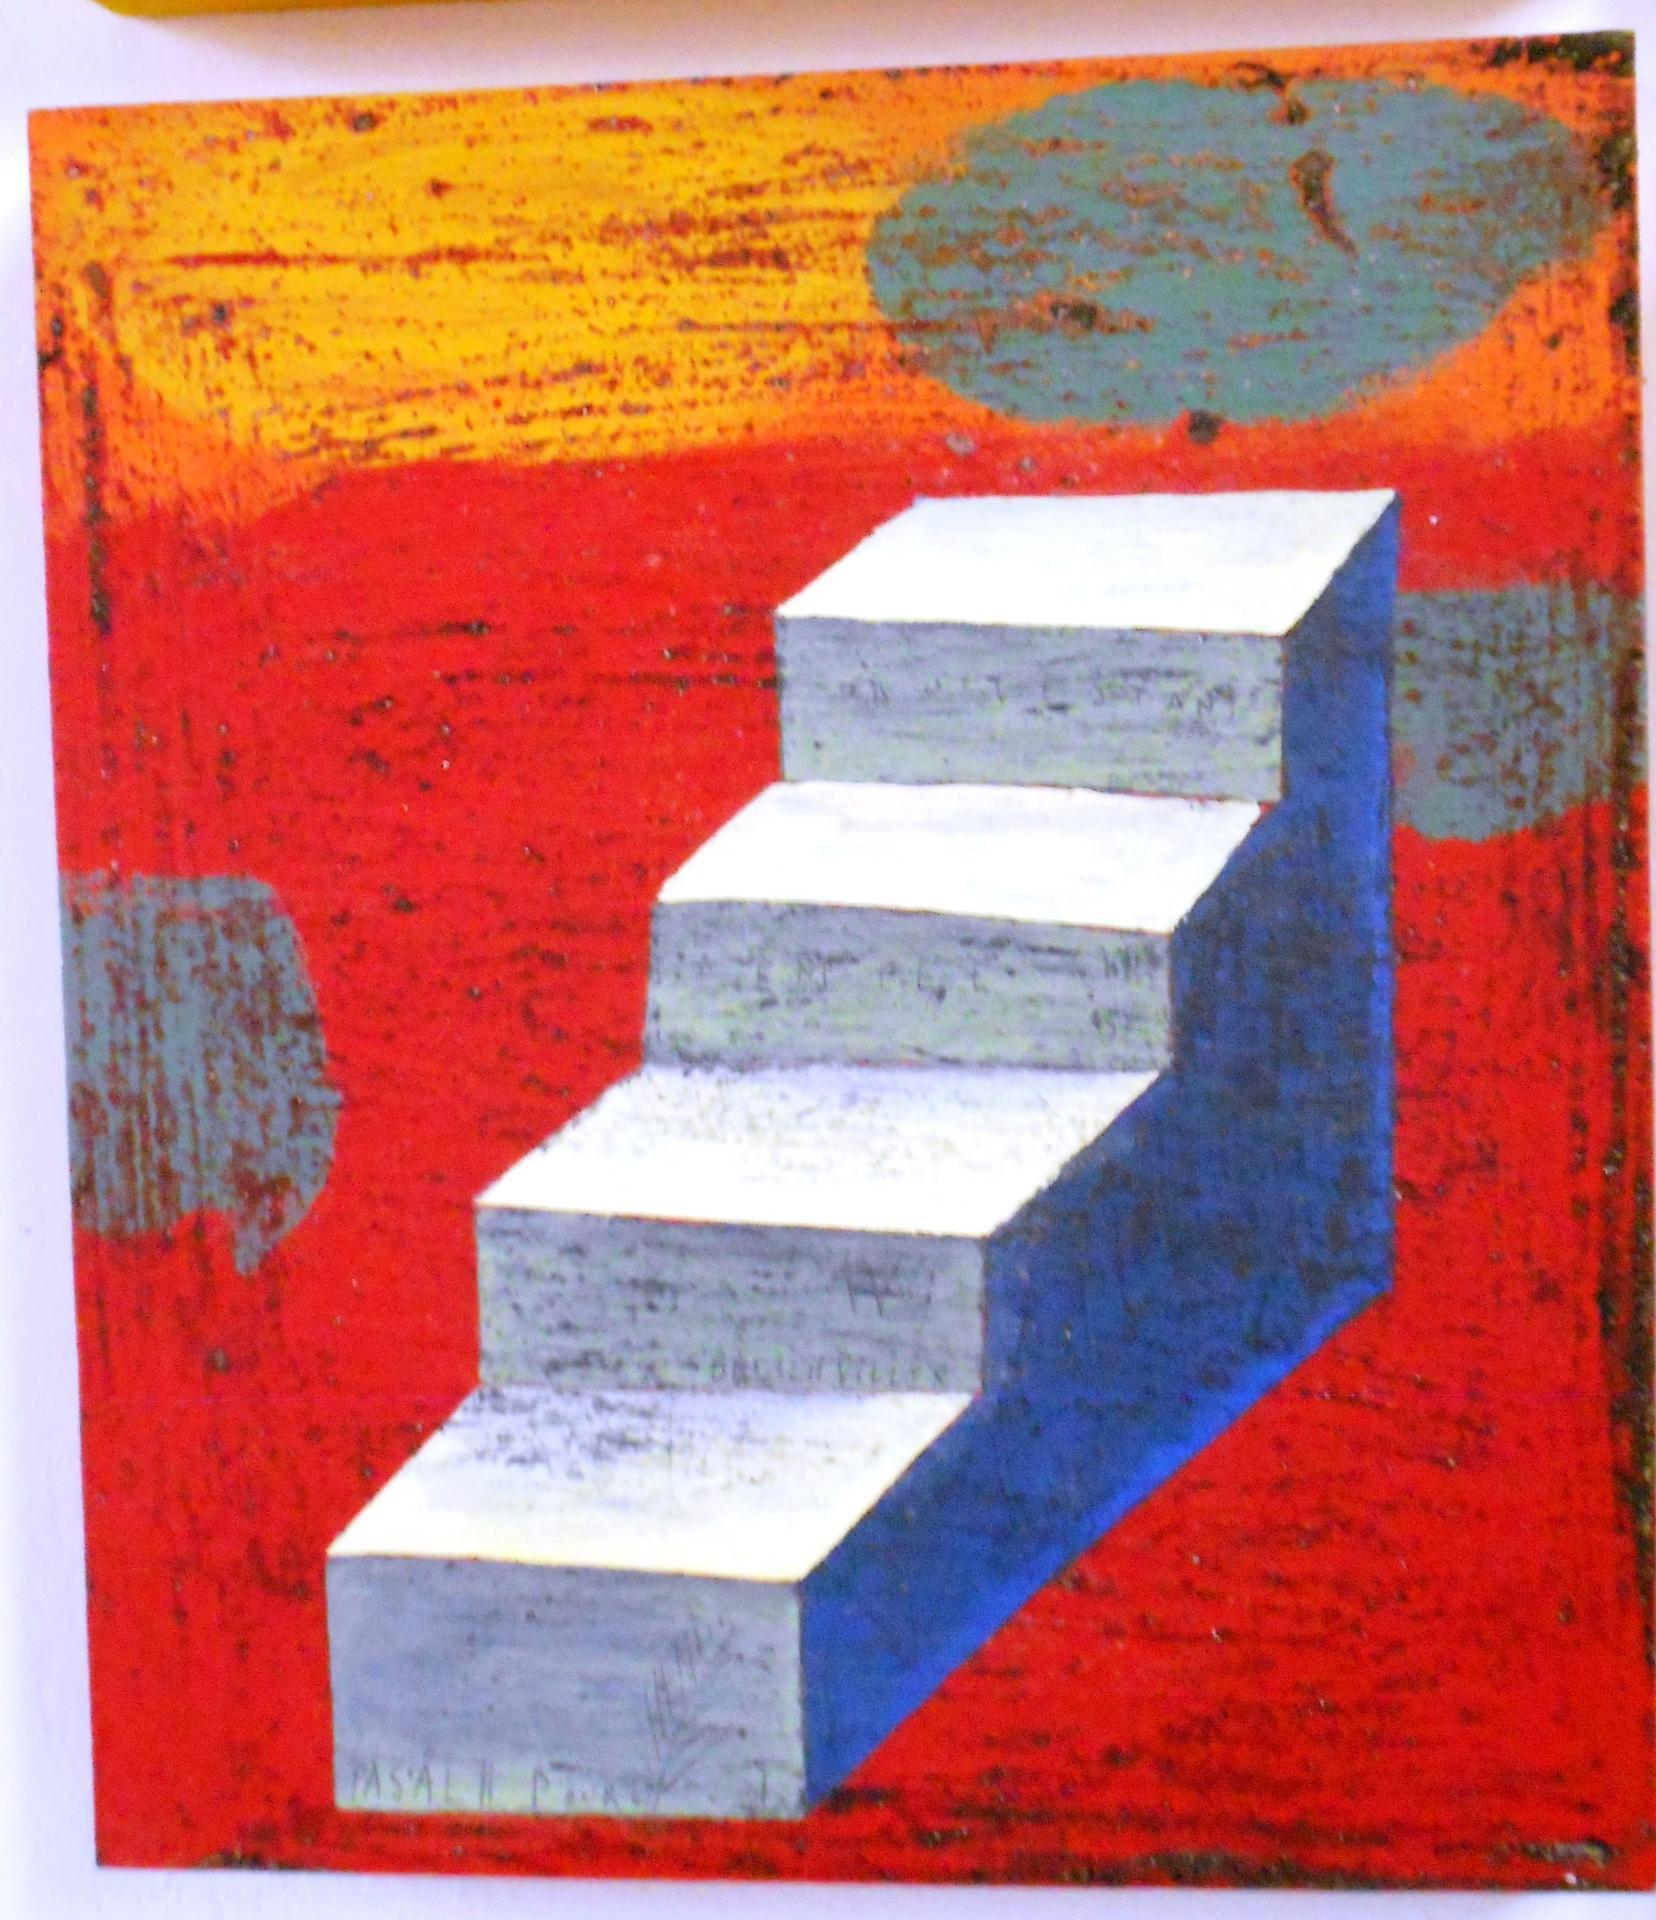 Escalier bleu fond rouge